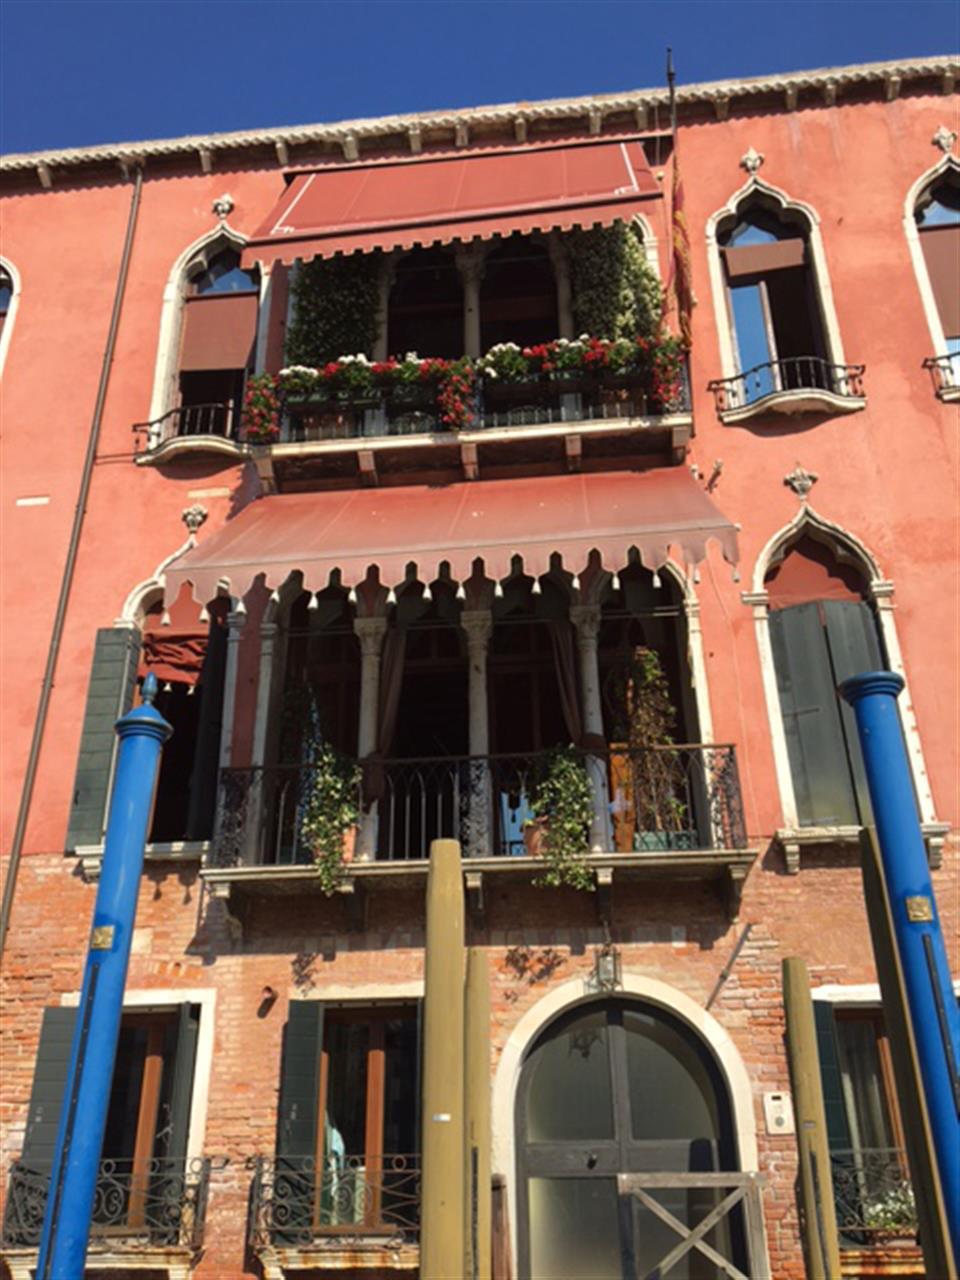 #Leadingrelocal #Venice #Italy